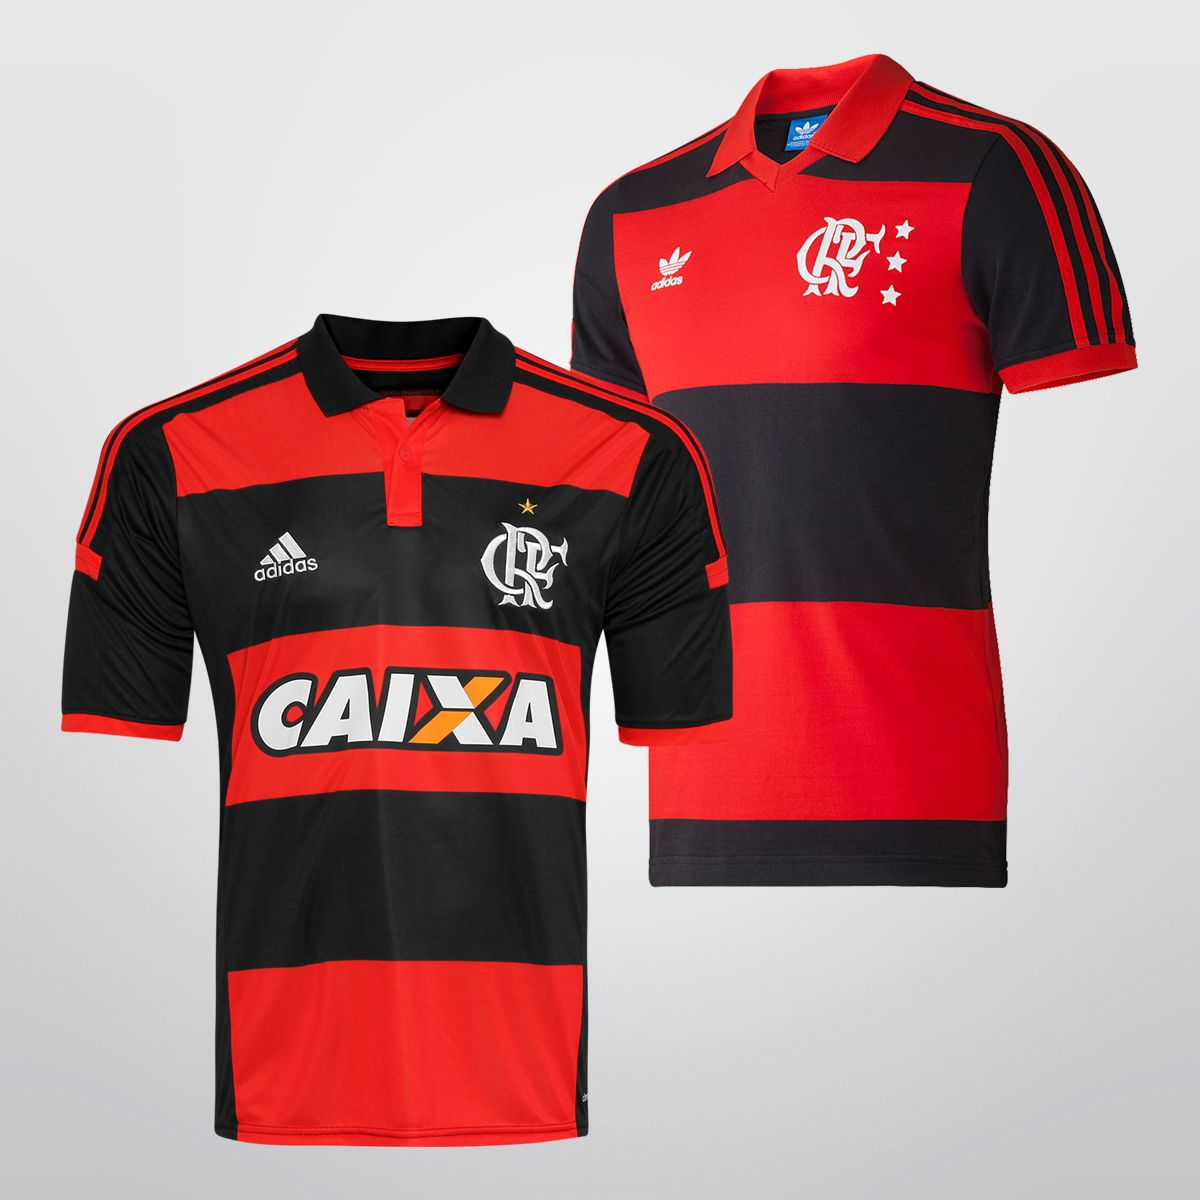 Camisa Adidas Flamengo I 14 15 + Camisa Retrô  1e497b16cf16d